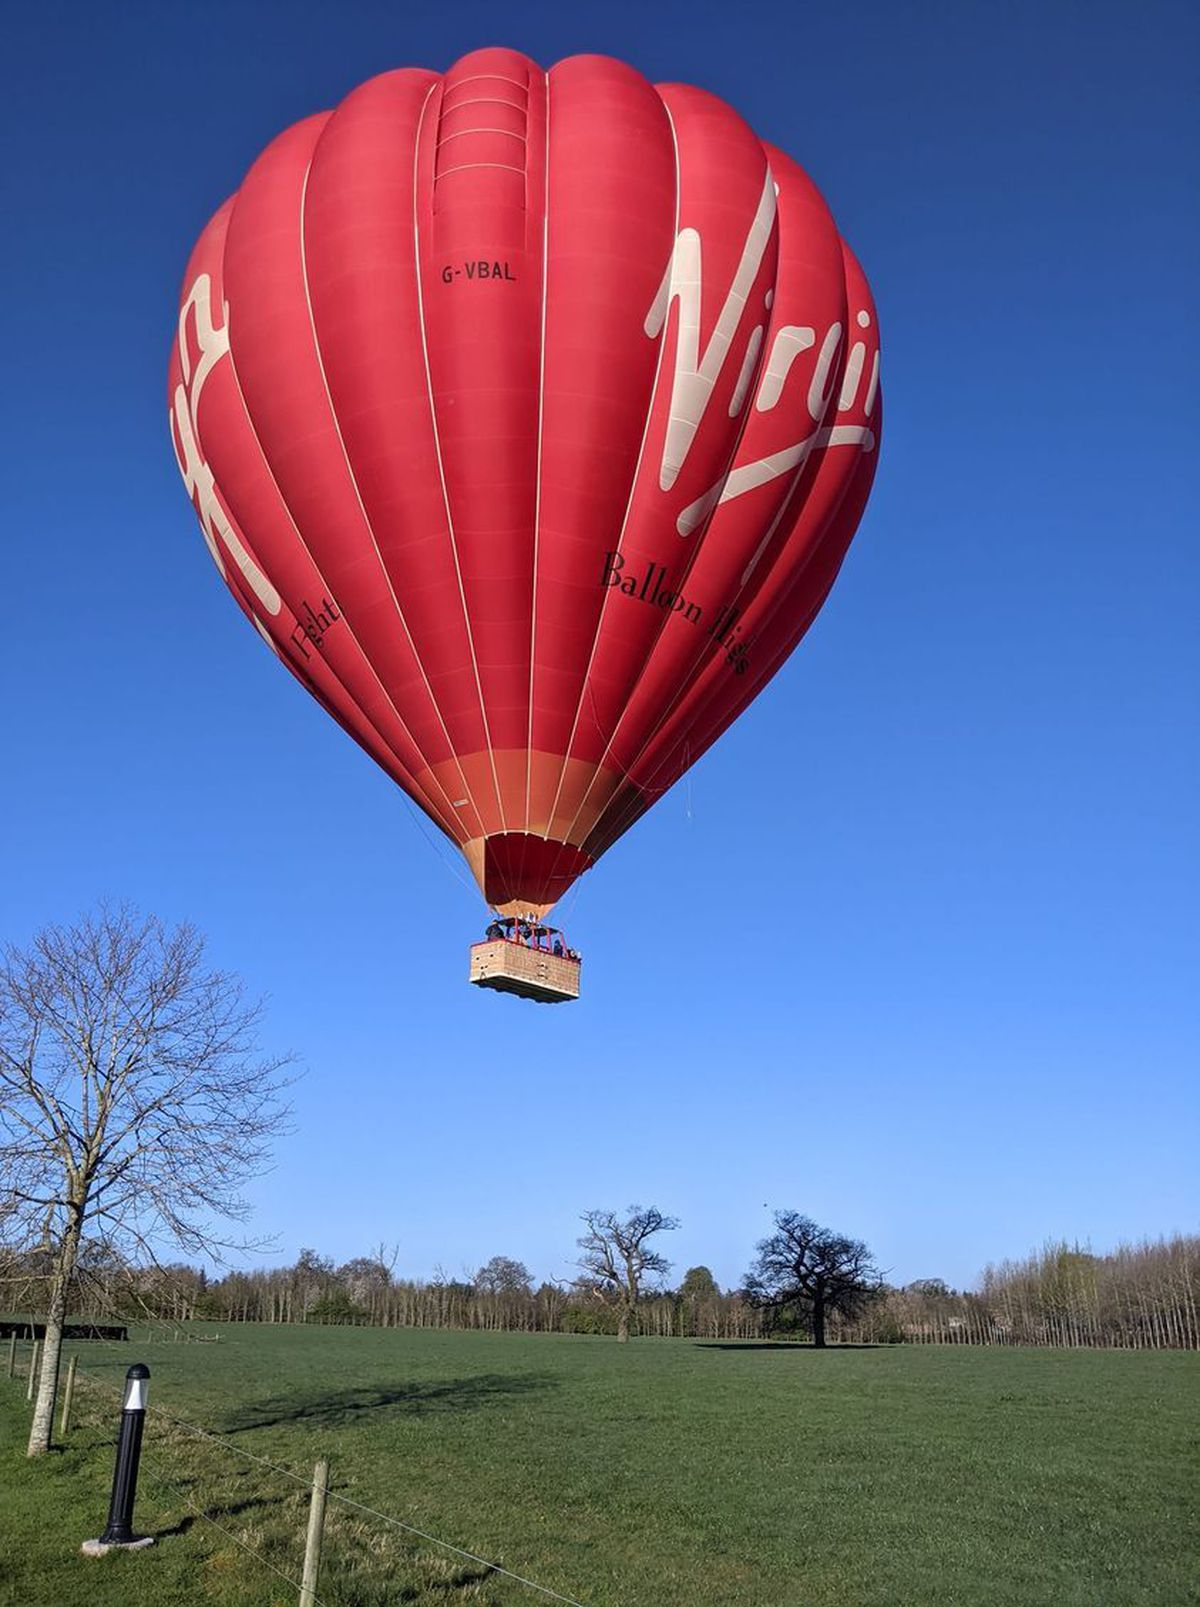 The Virgin balloon takes to the skies